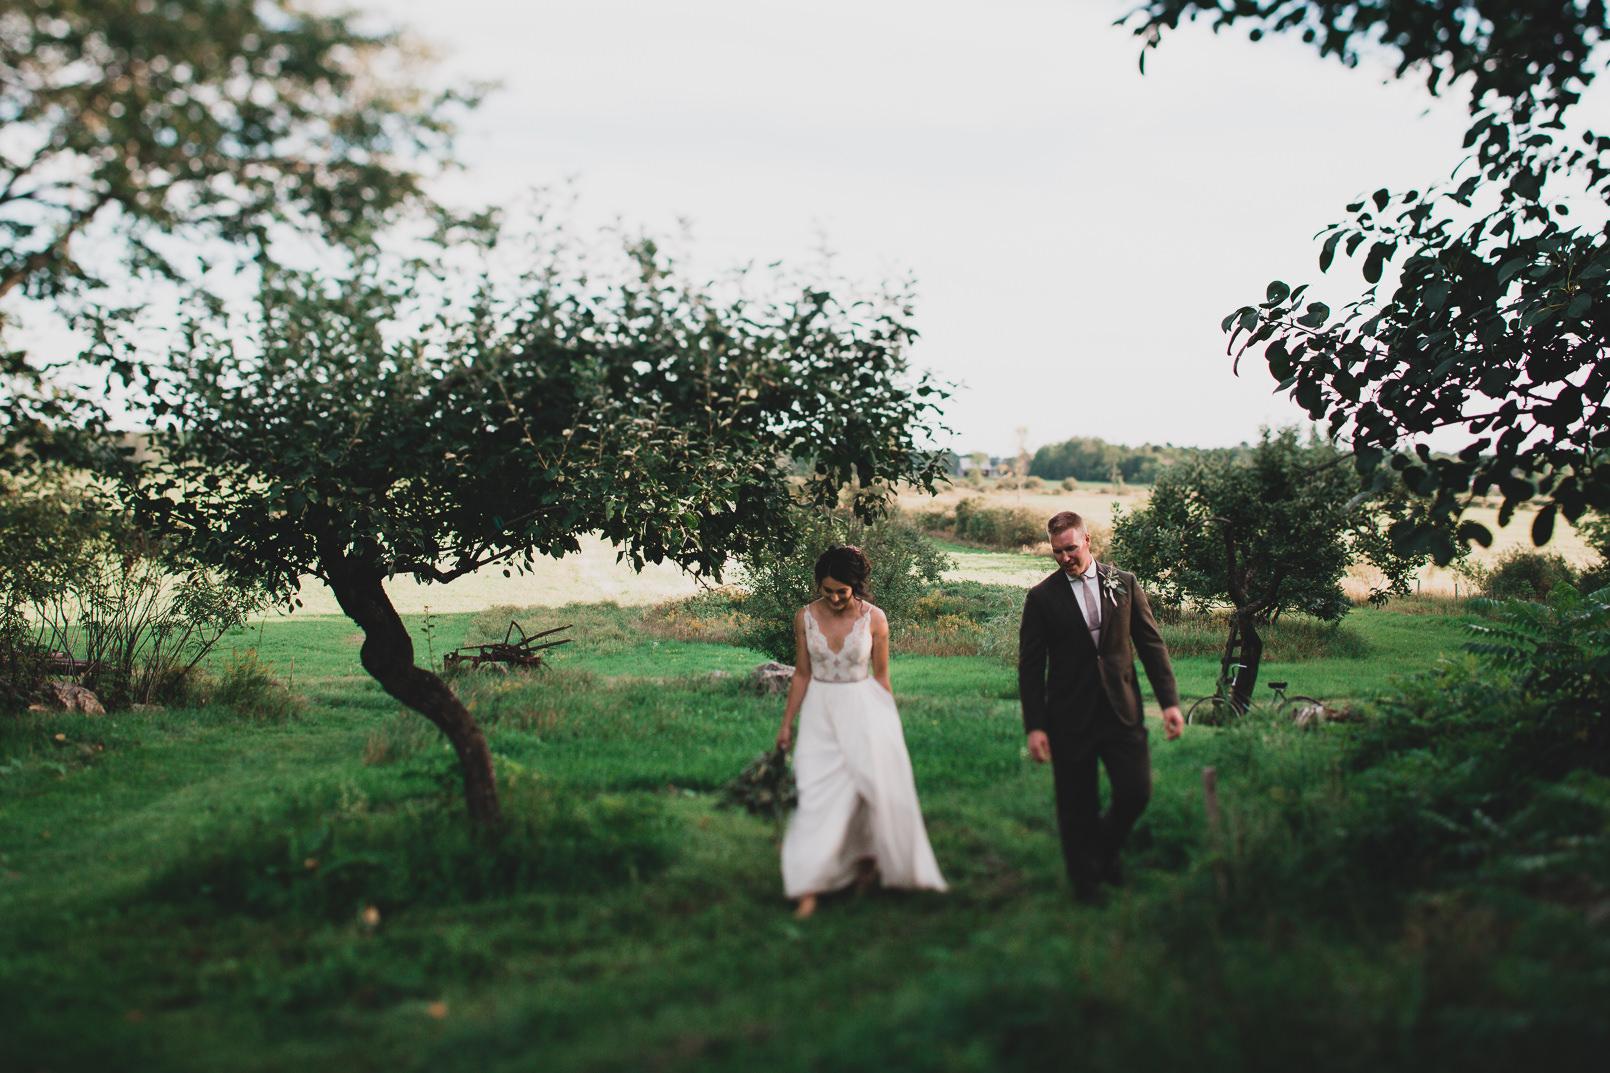 027-Jonathan-Kuhn-Photography-Wedding-_mini.jpg